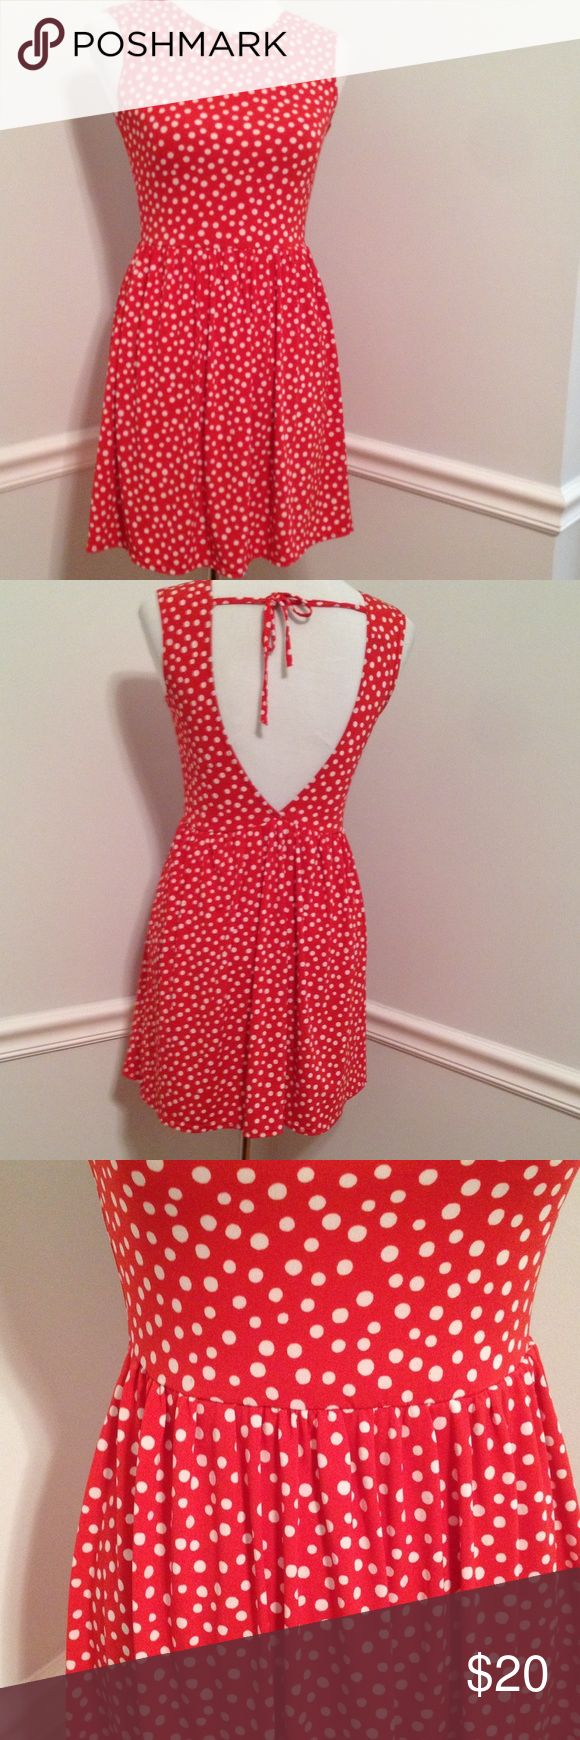 Asos Polka Dot Dress Polka Dot Dress Petite about 31 1/2 inches long ASOS Petite Dresses